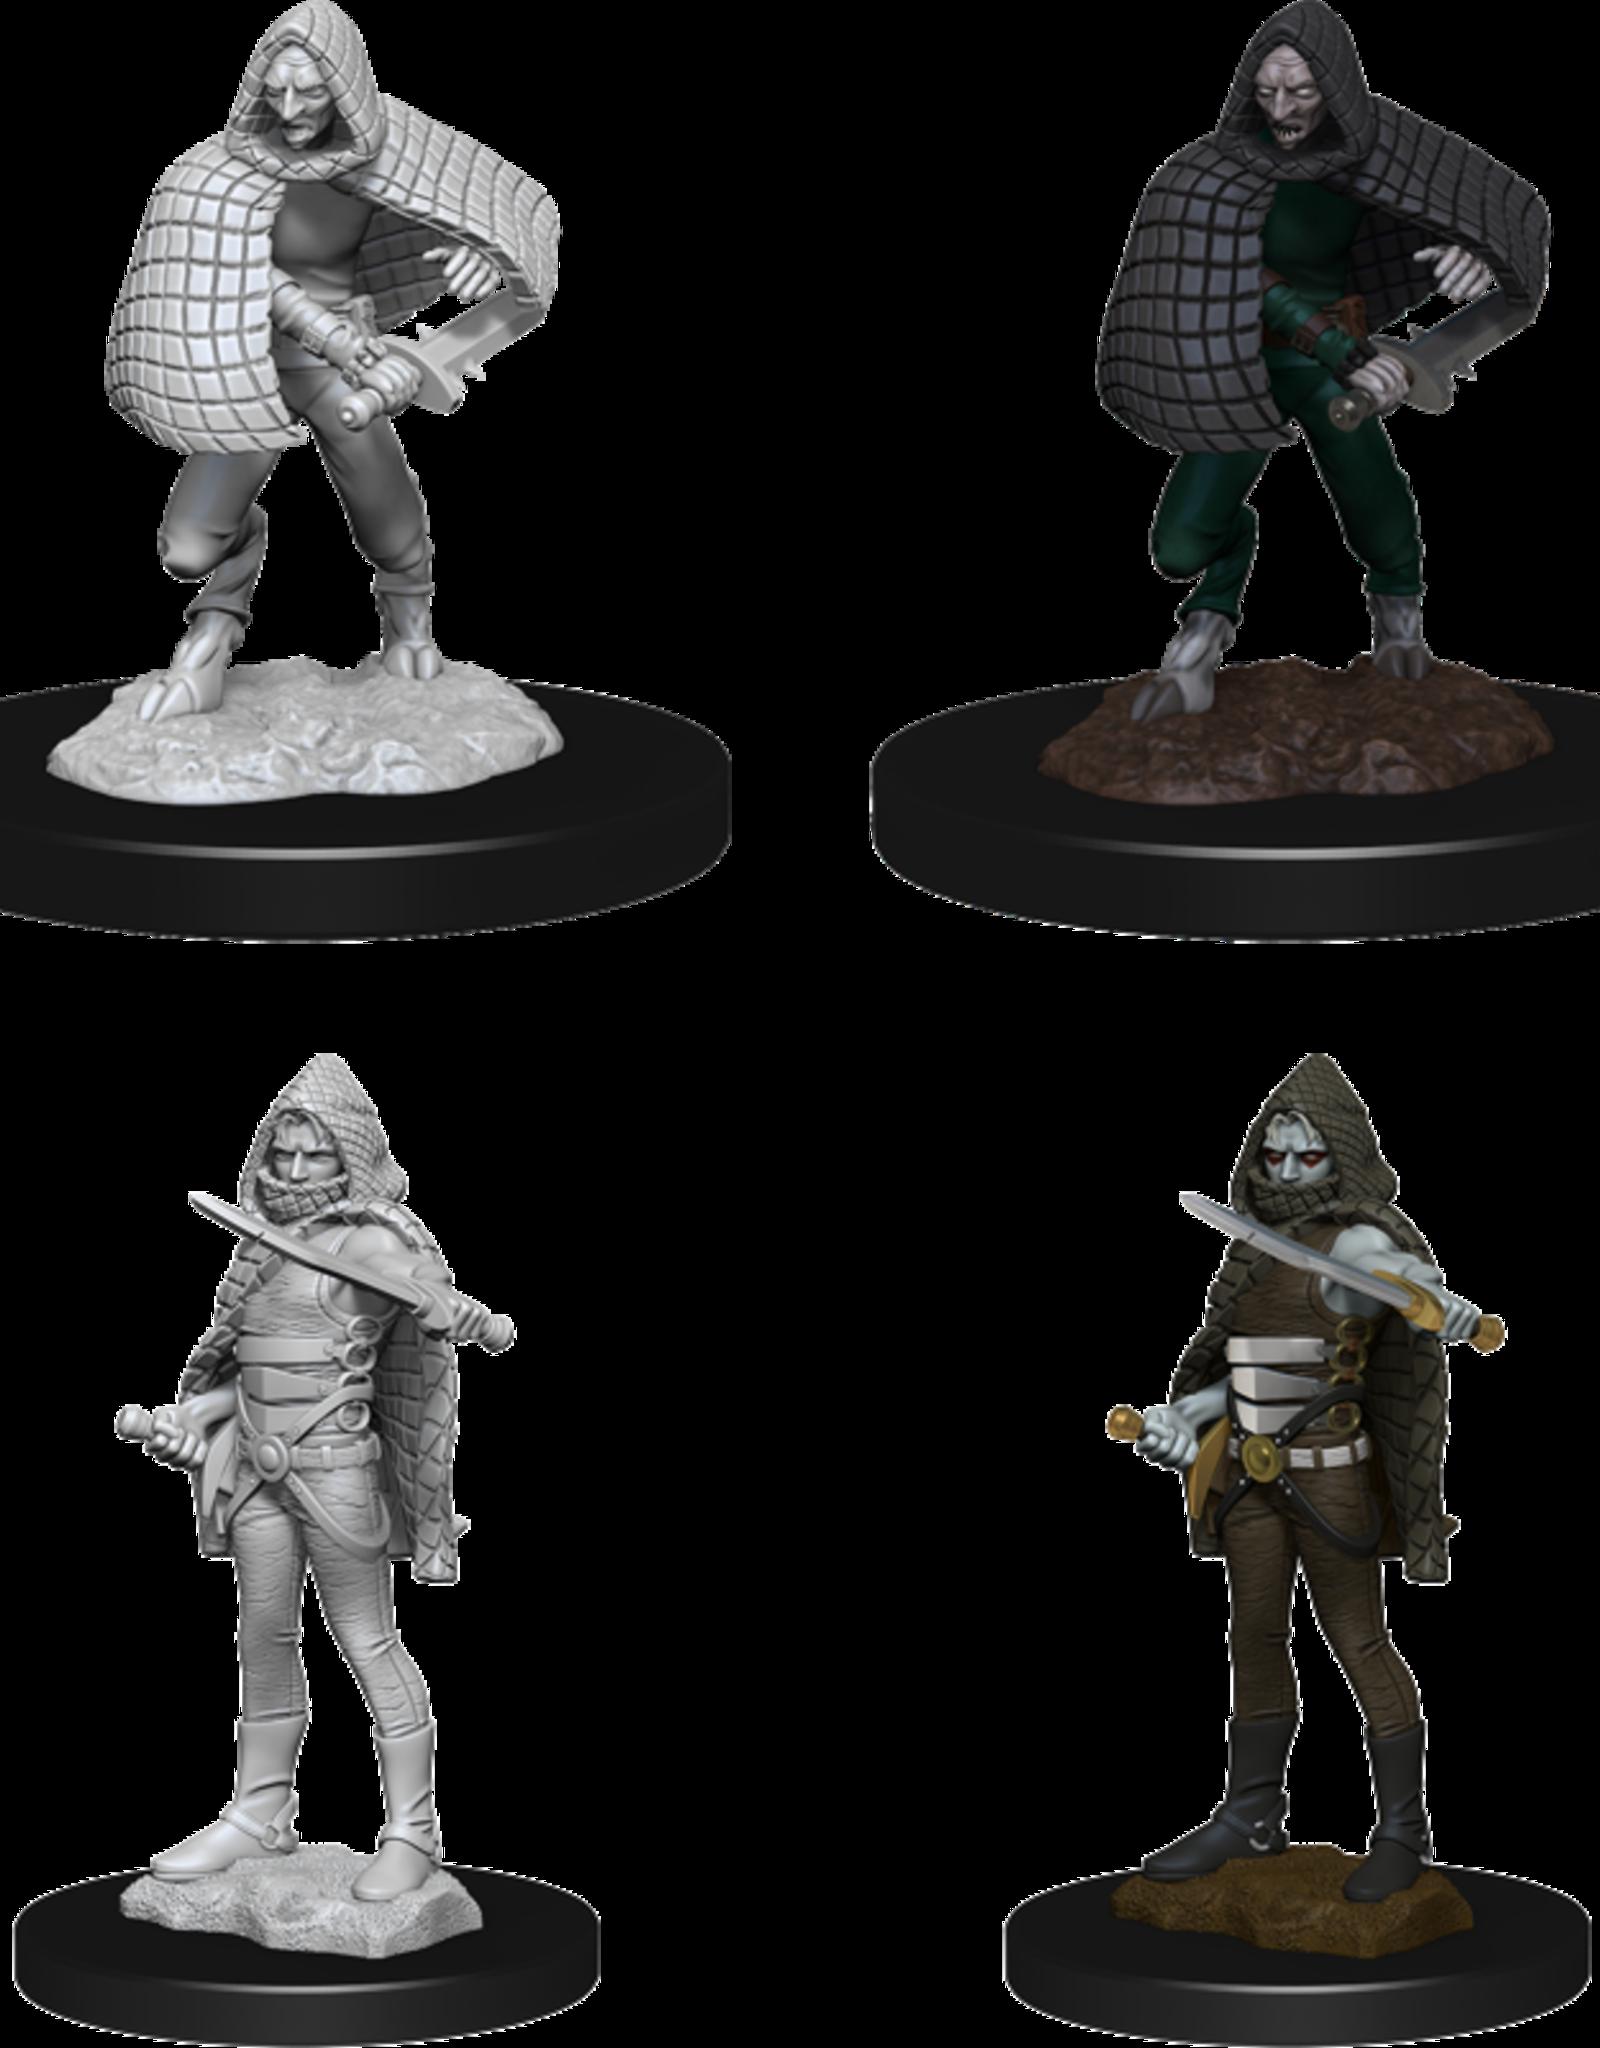 Wizkids D&D Nolzur's Marvelous Miniatures Darkling Elder and Darklings